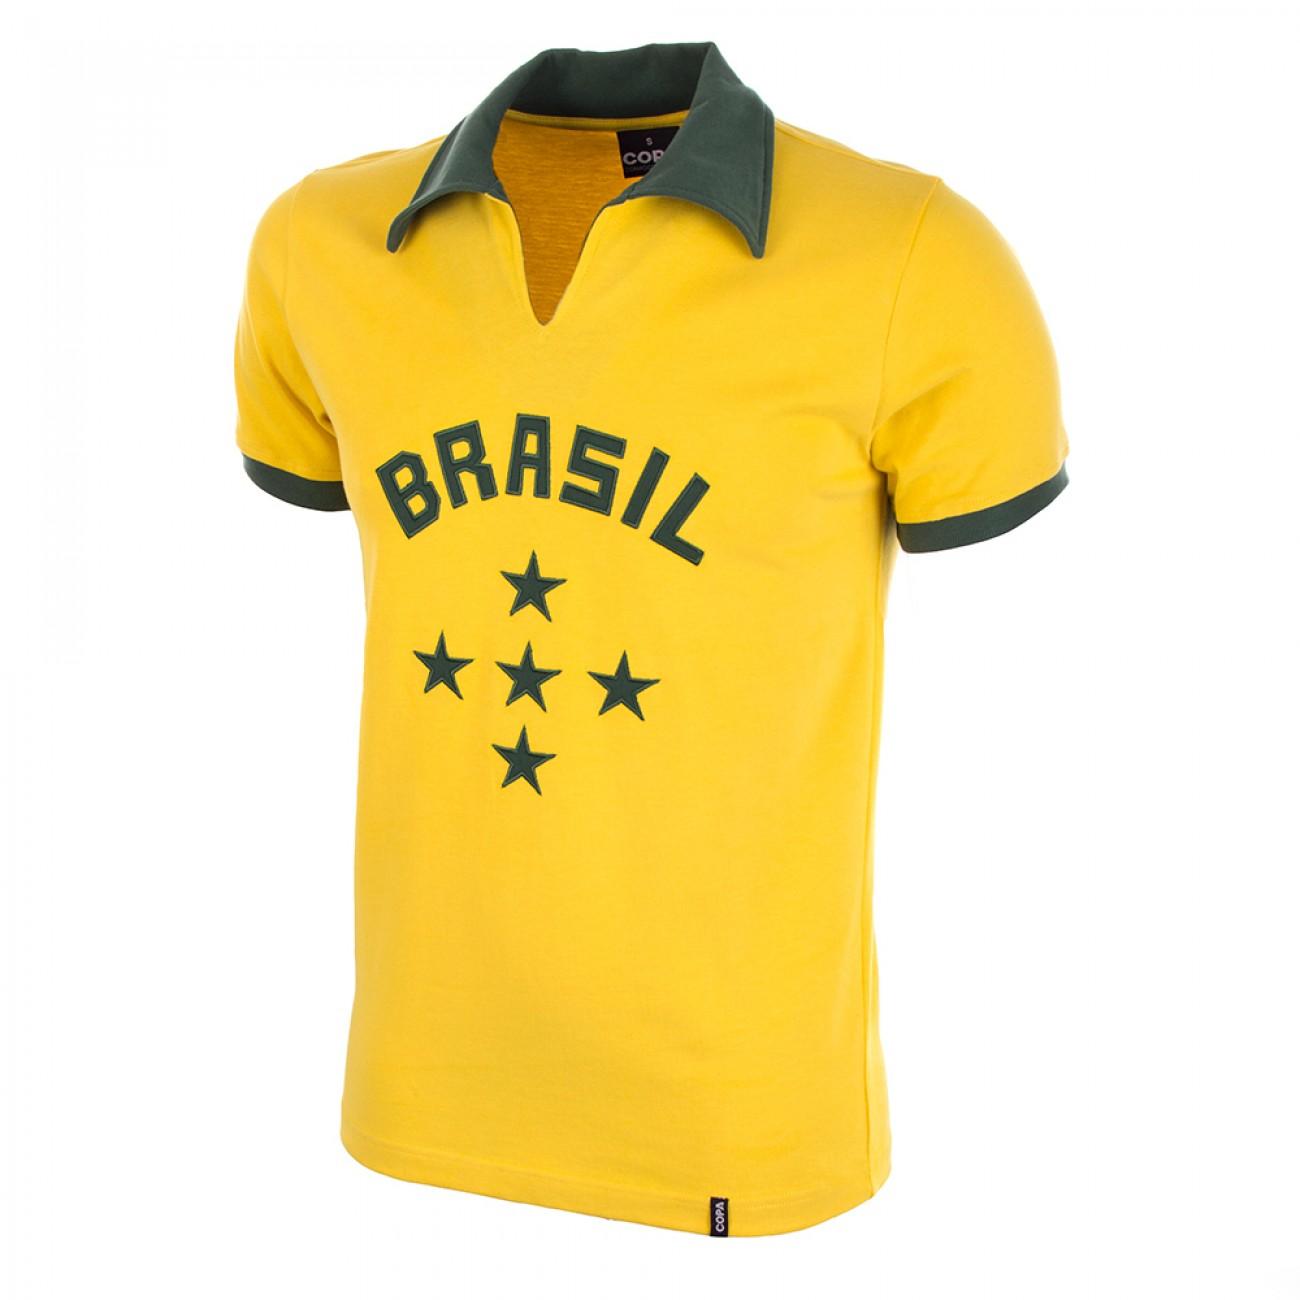 http://www.retrofootball.es/ropa-de-futbol/camiseta-brasil-a-os-60-estrellas.html